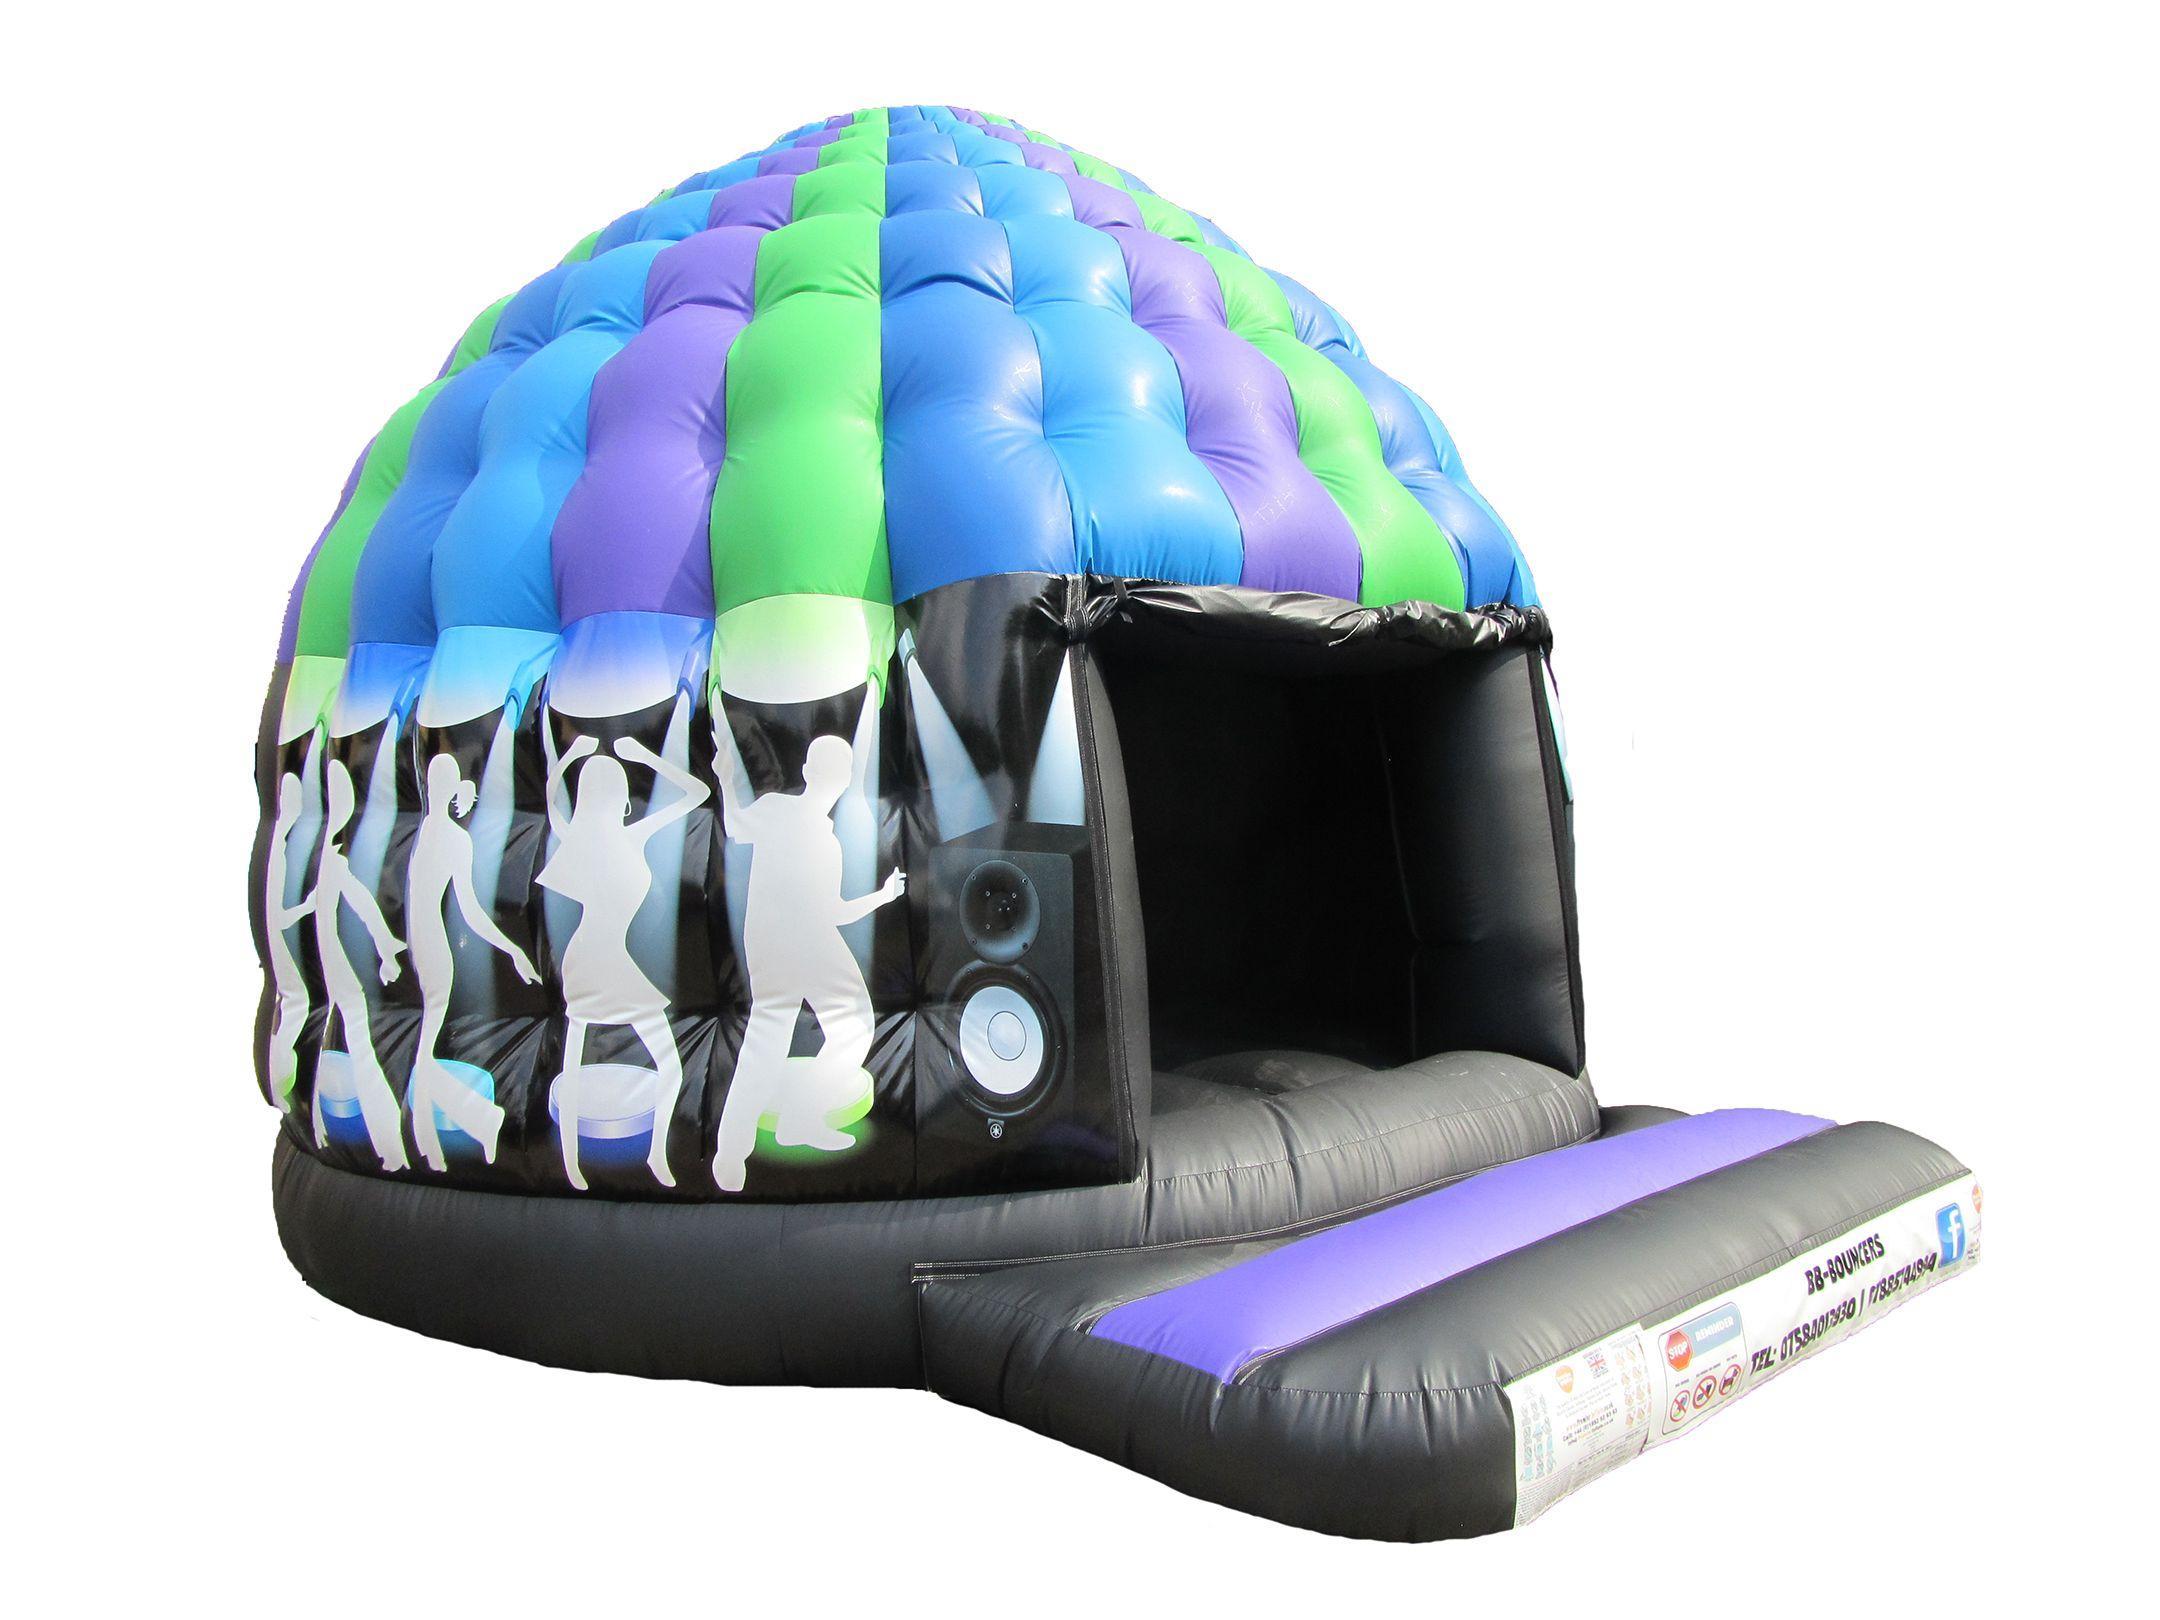 17x12 circular disco dome inflatable 3 compressor